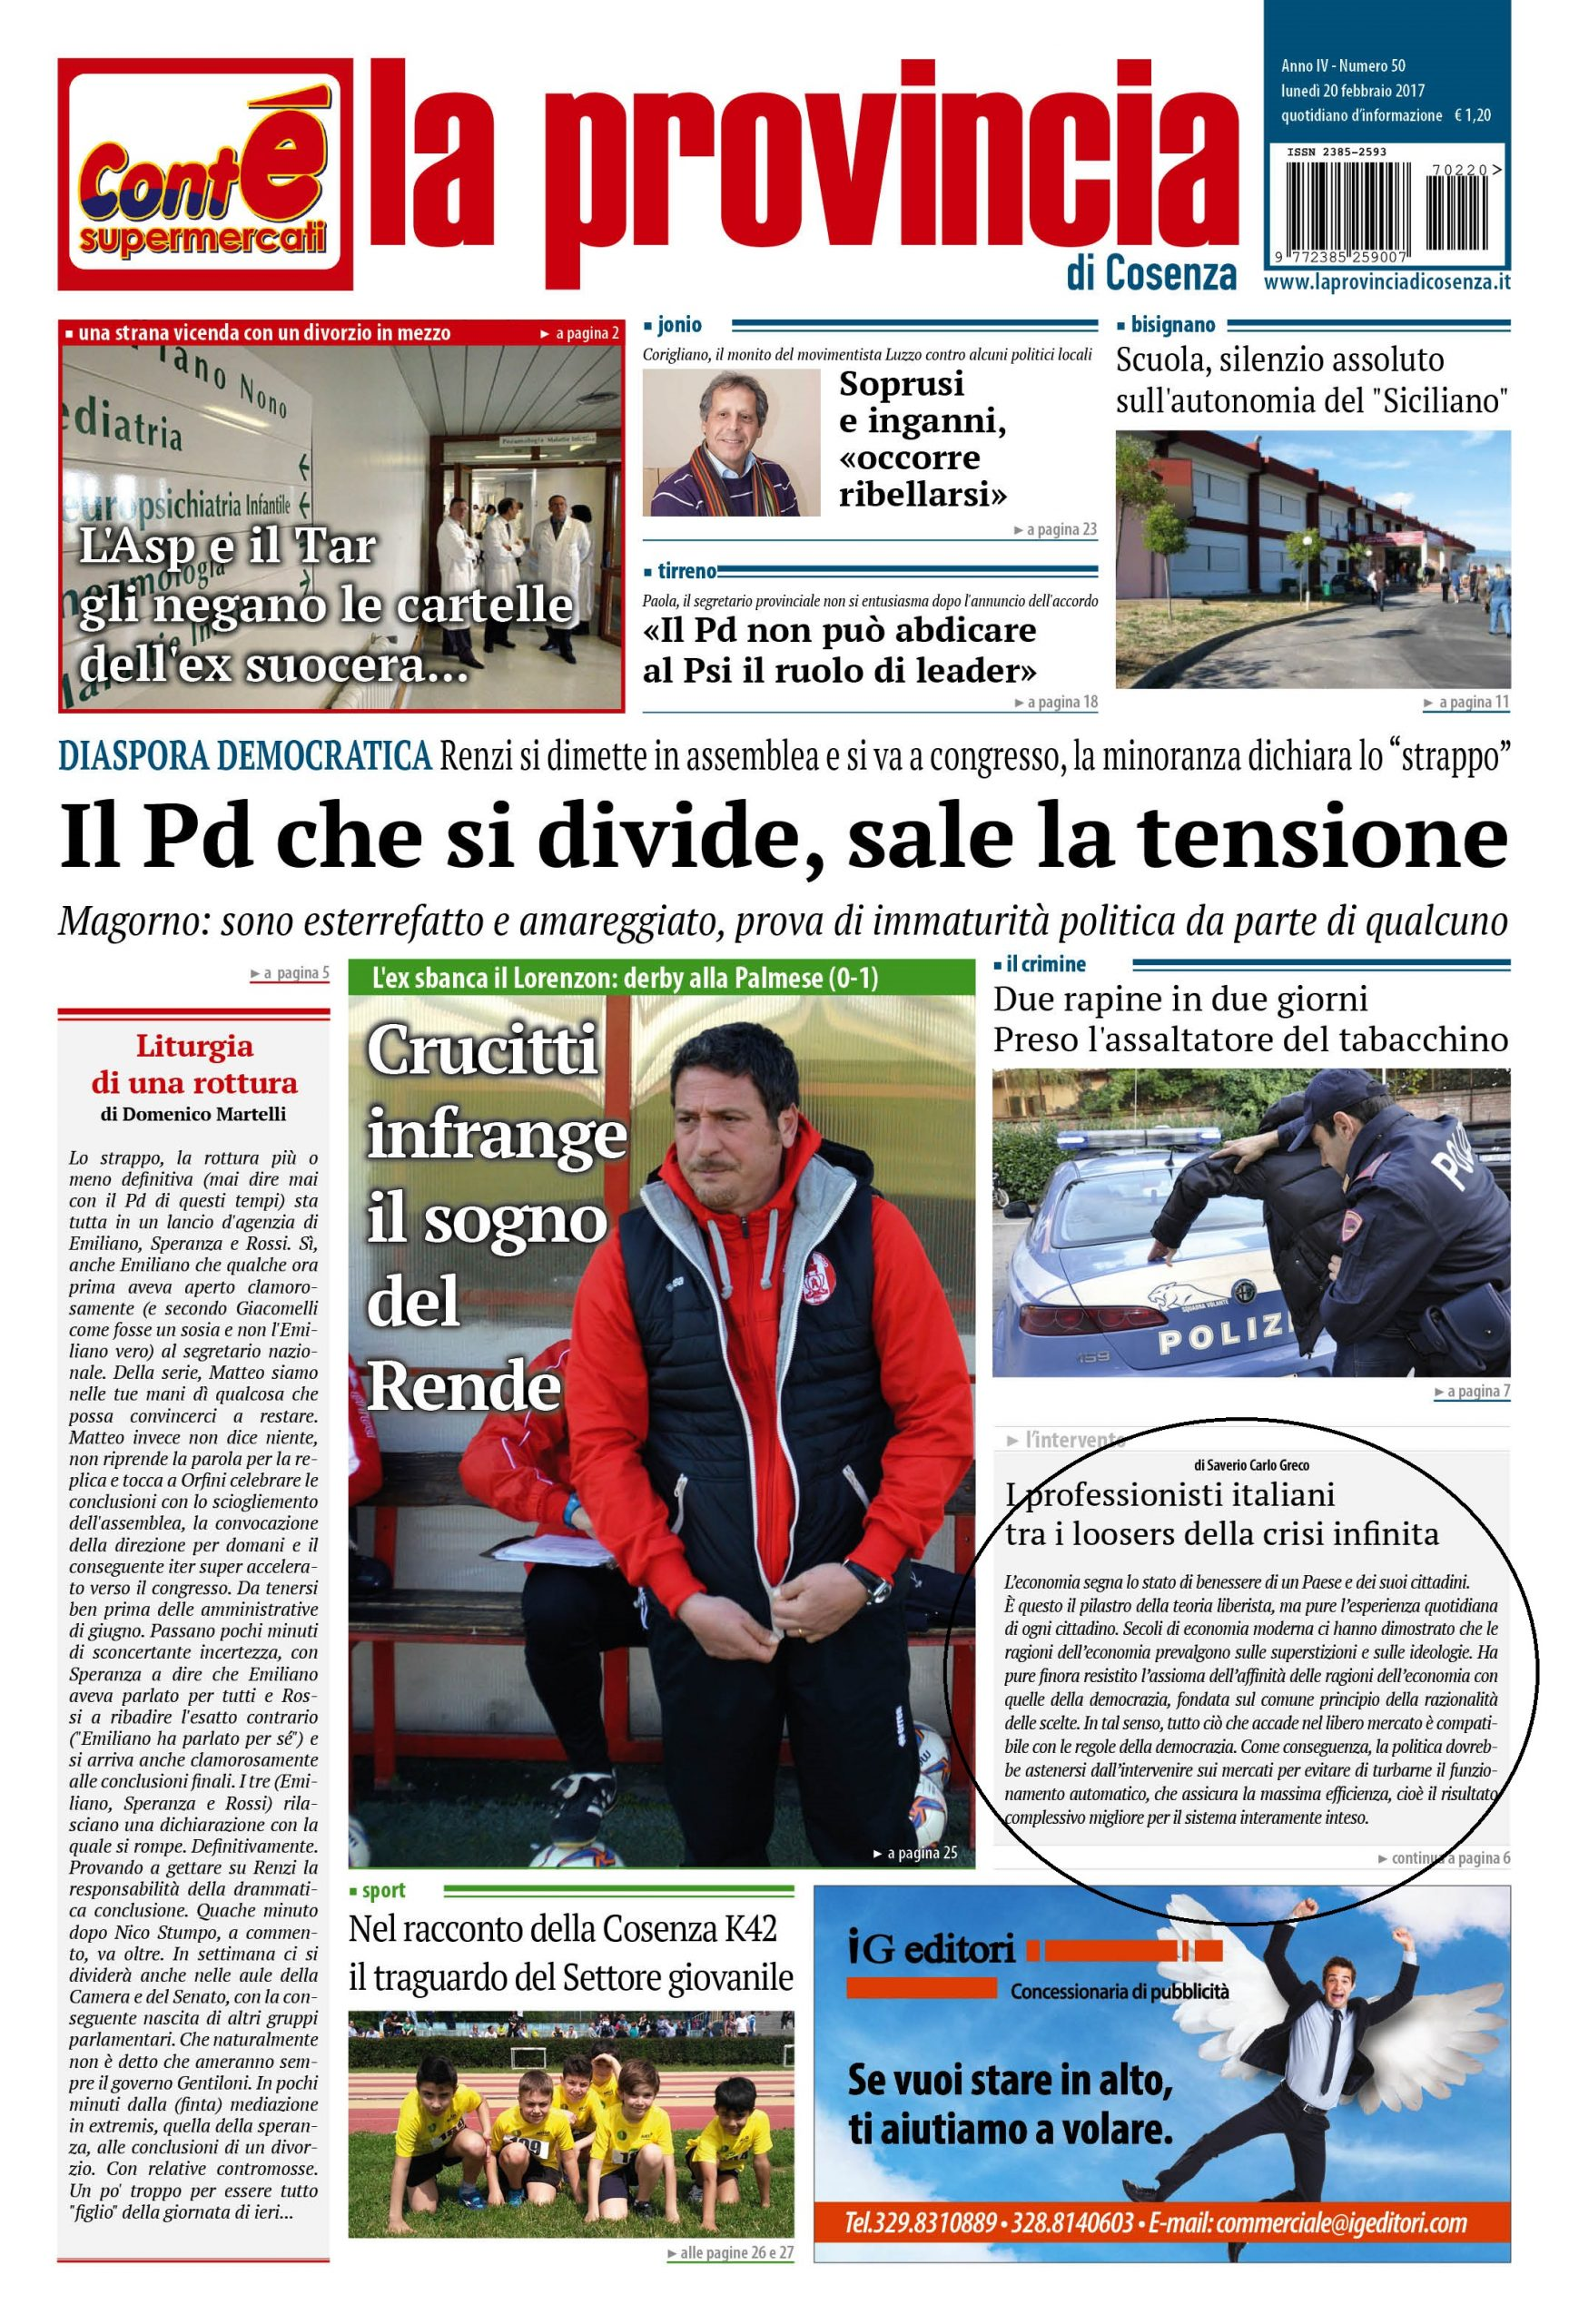 I Professionisti italiani tra i loosers della crisi infinita